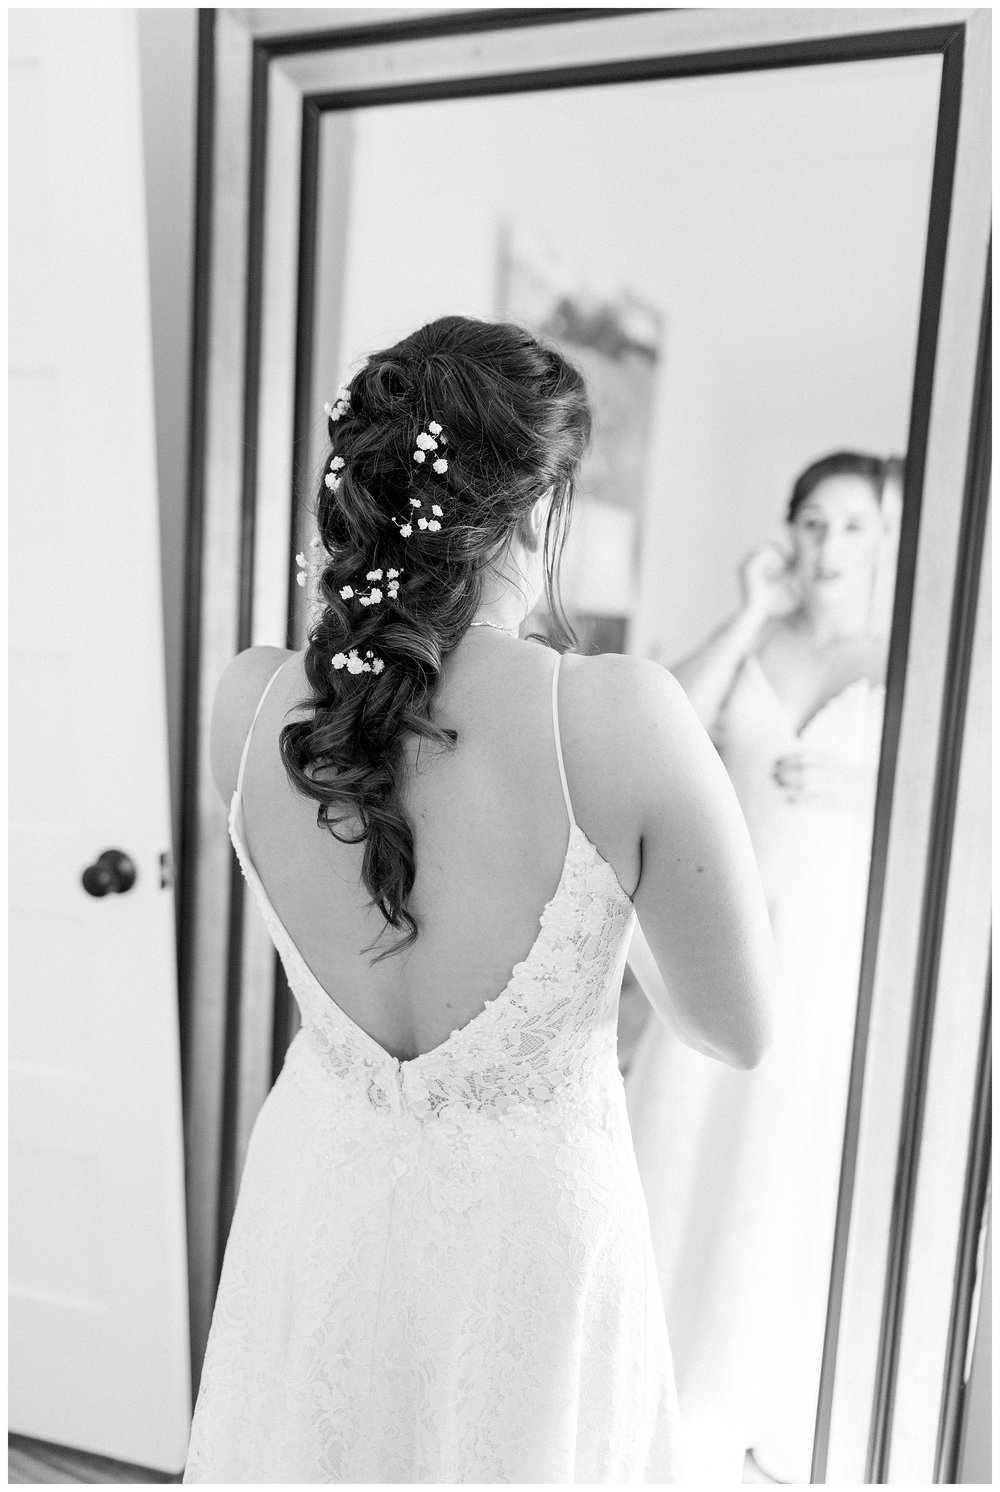 Stone Tower Winery Wedding | Virginia Winter Wedding | VA Wedding Photographer Kir Tuben_0019.jpg